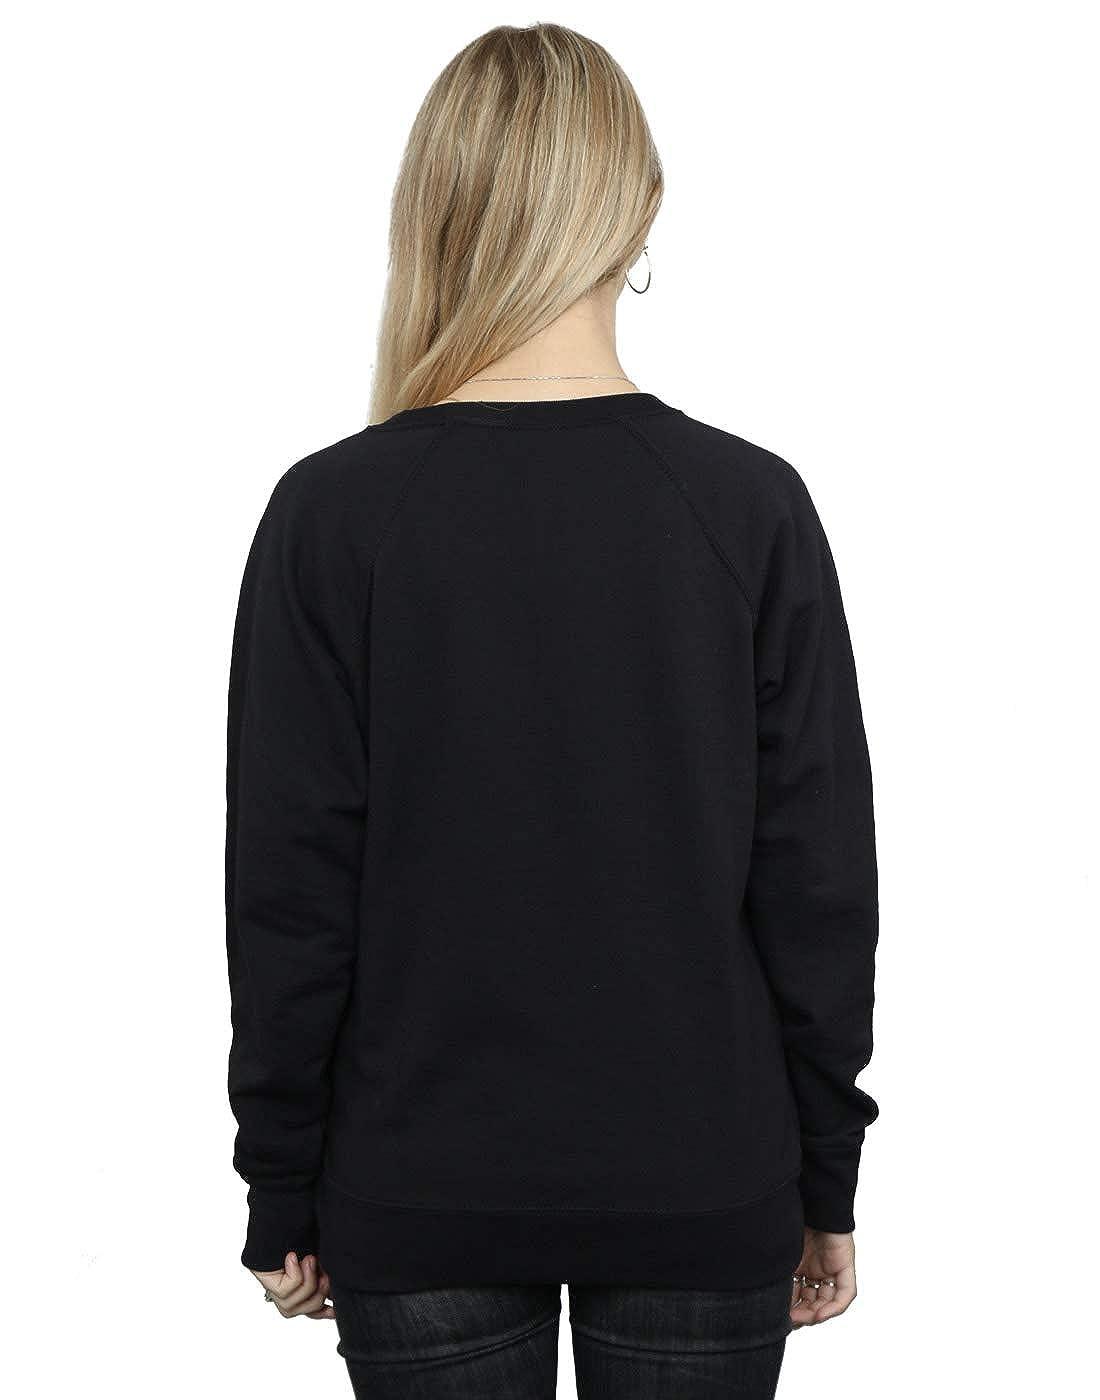 DC Comics Womens The Flash Star Labs Sweatshirt